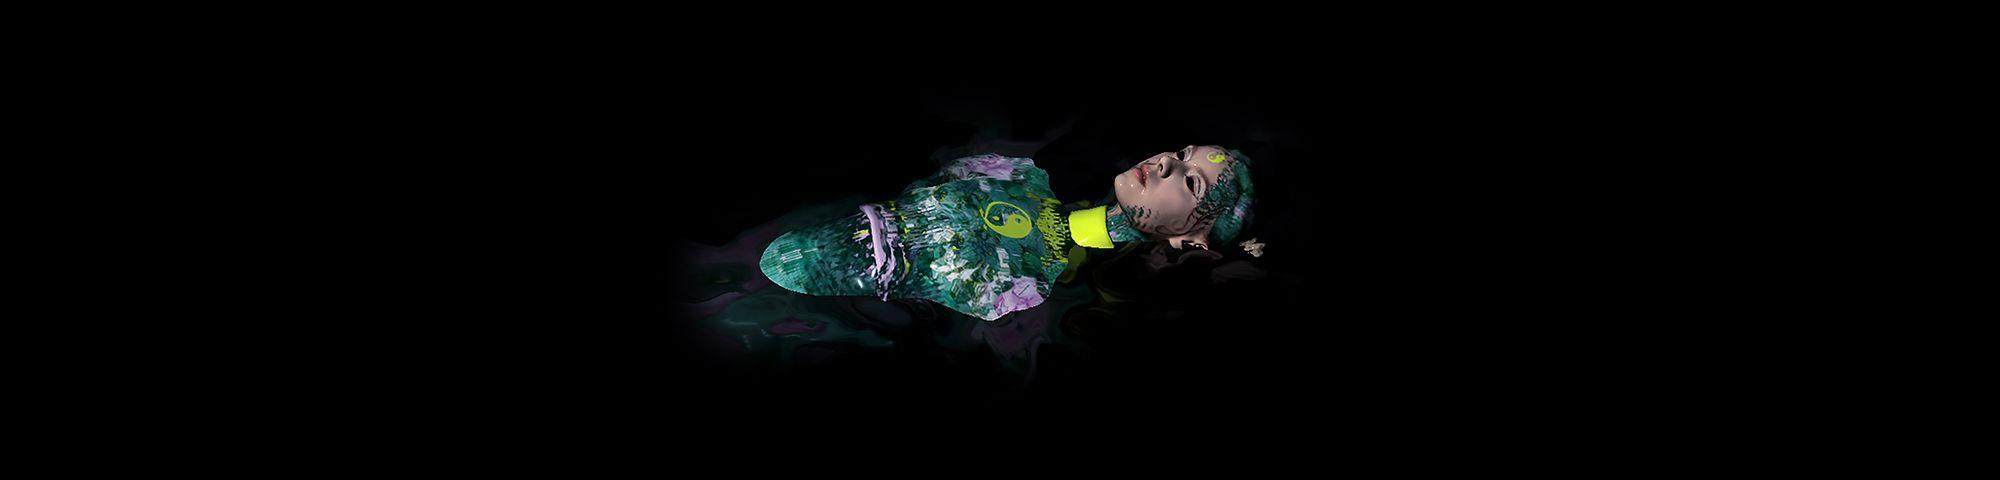 Digital illustration of body floating on black background